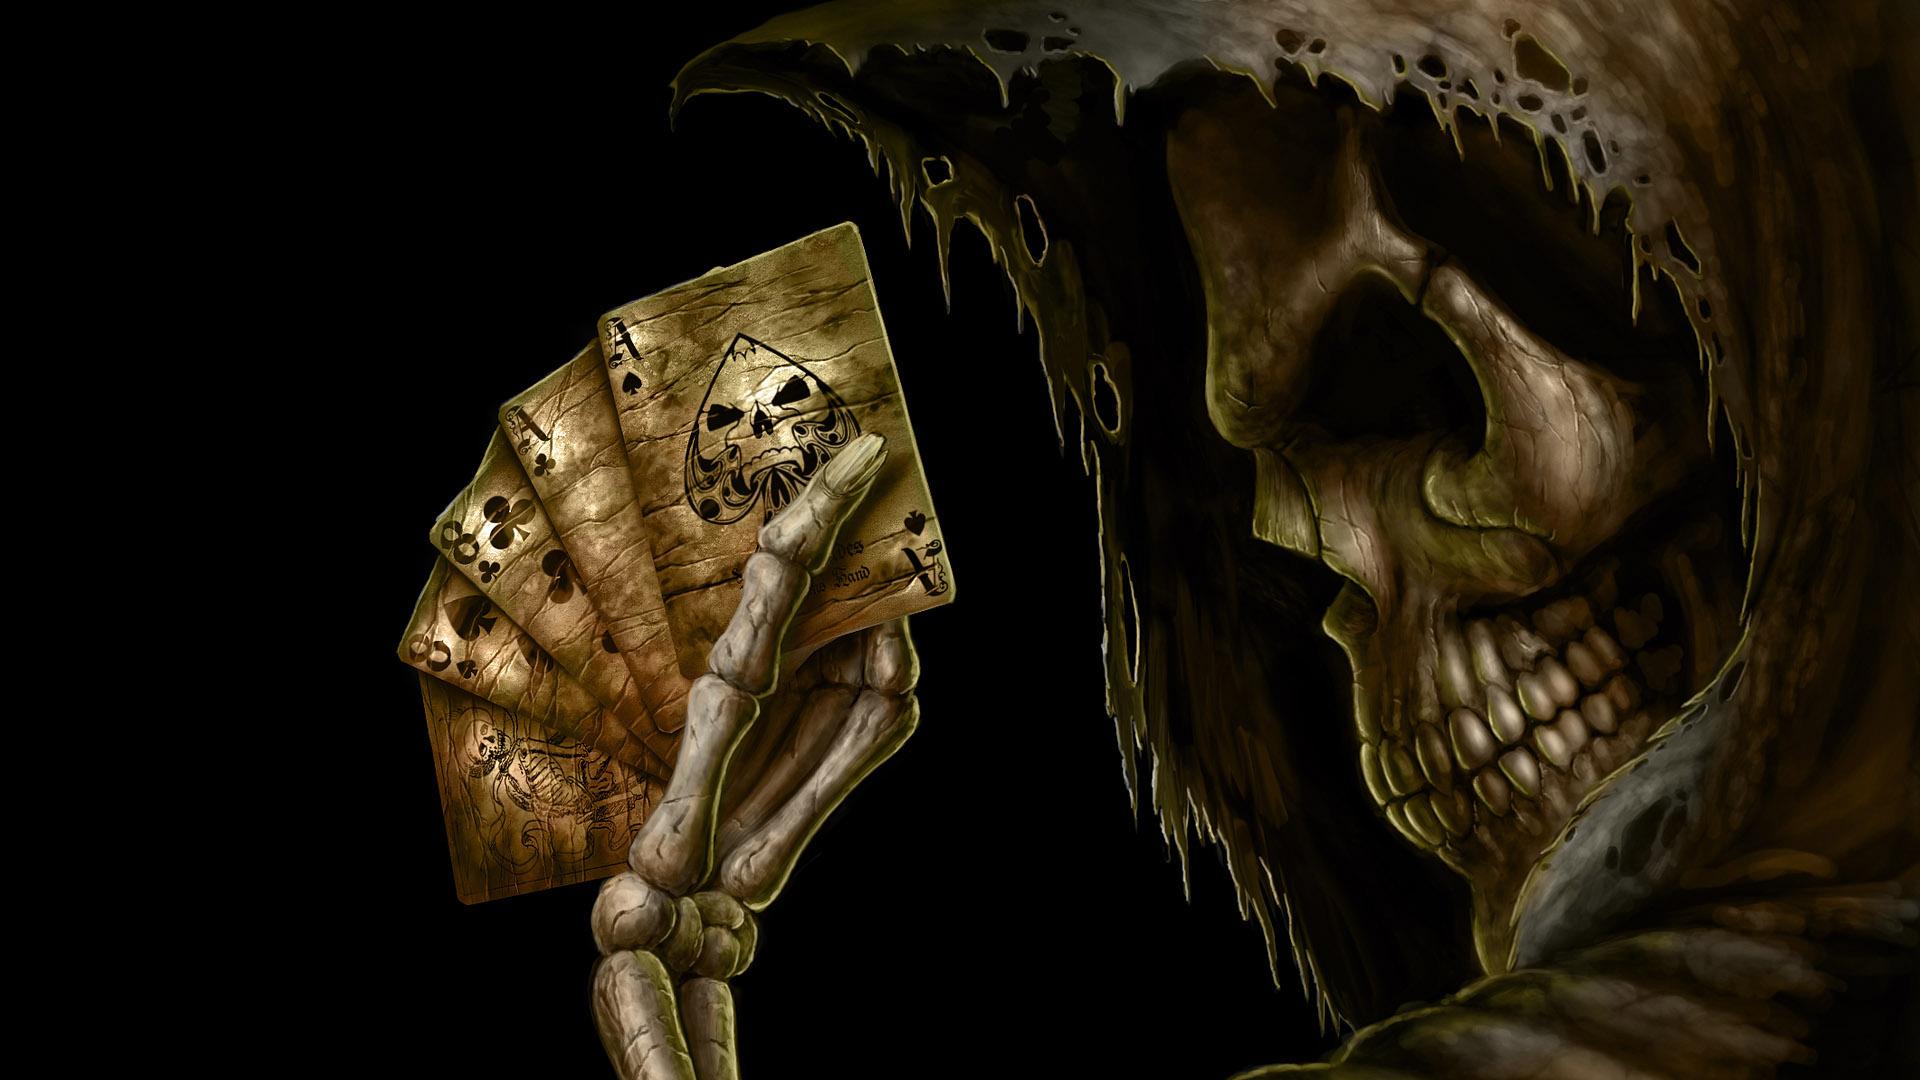 Donker - Grim Reaper  Schedel Donker Wallpaper